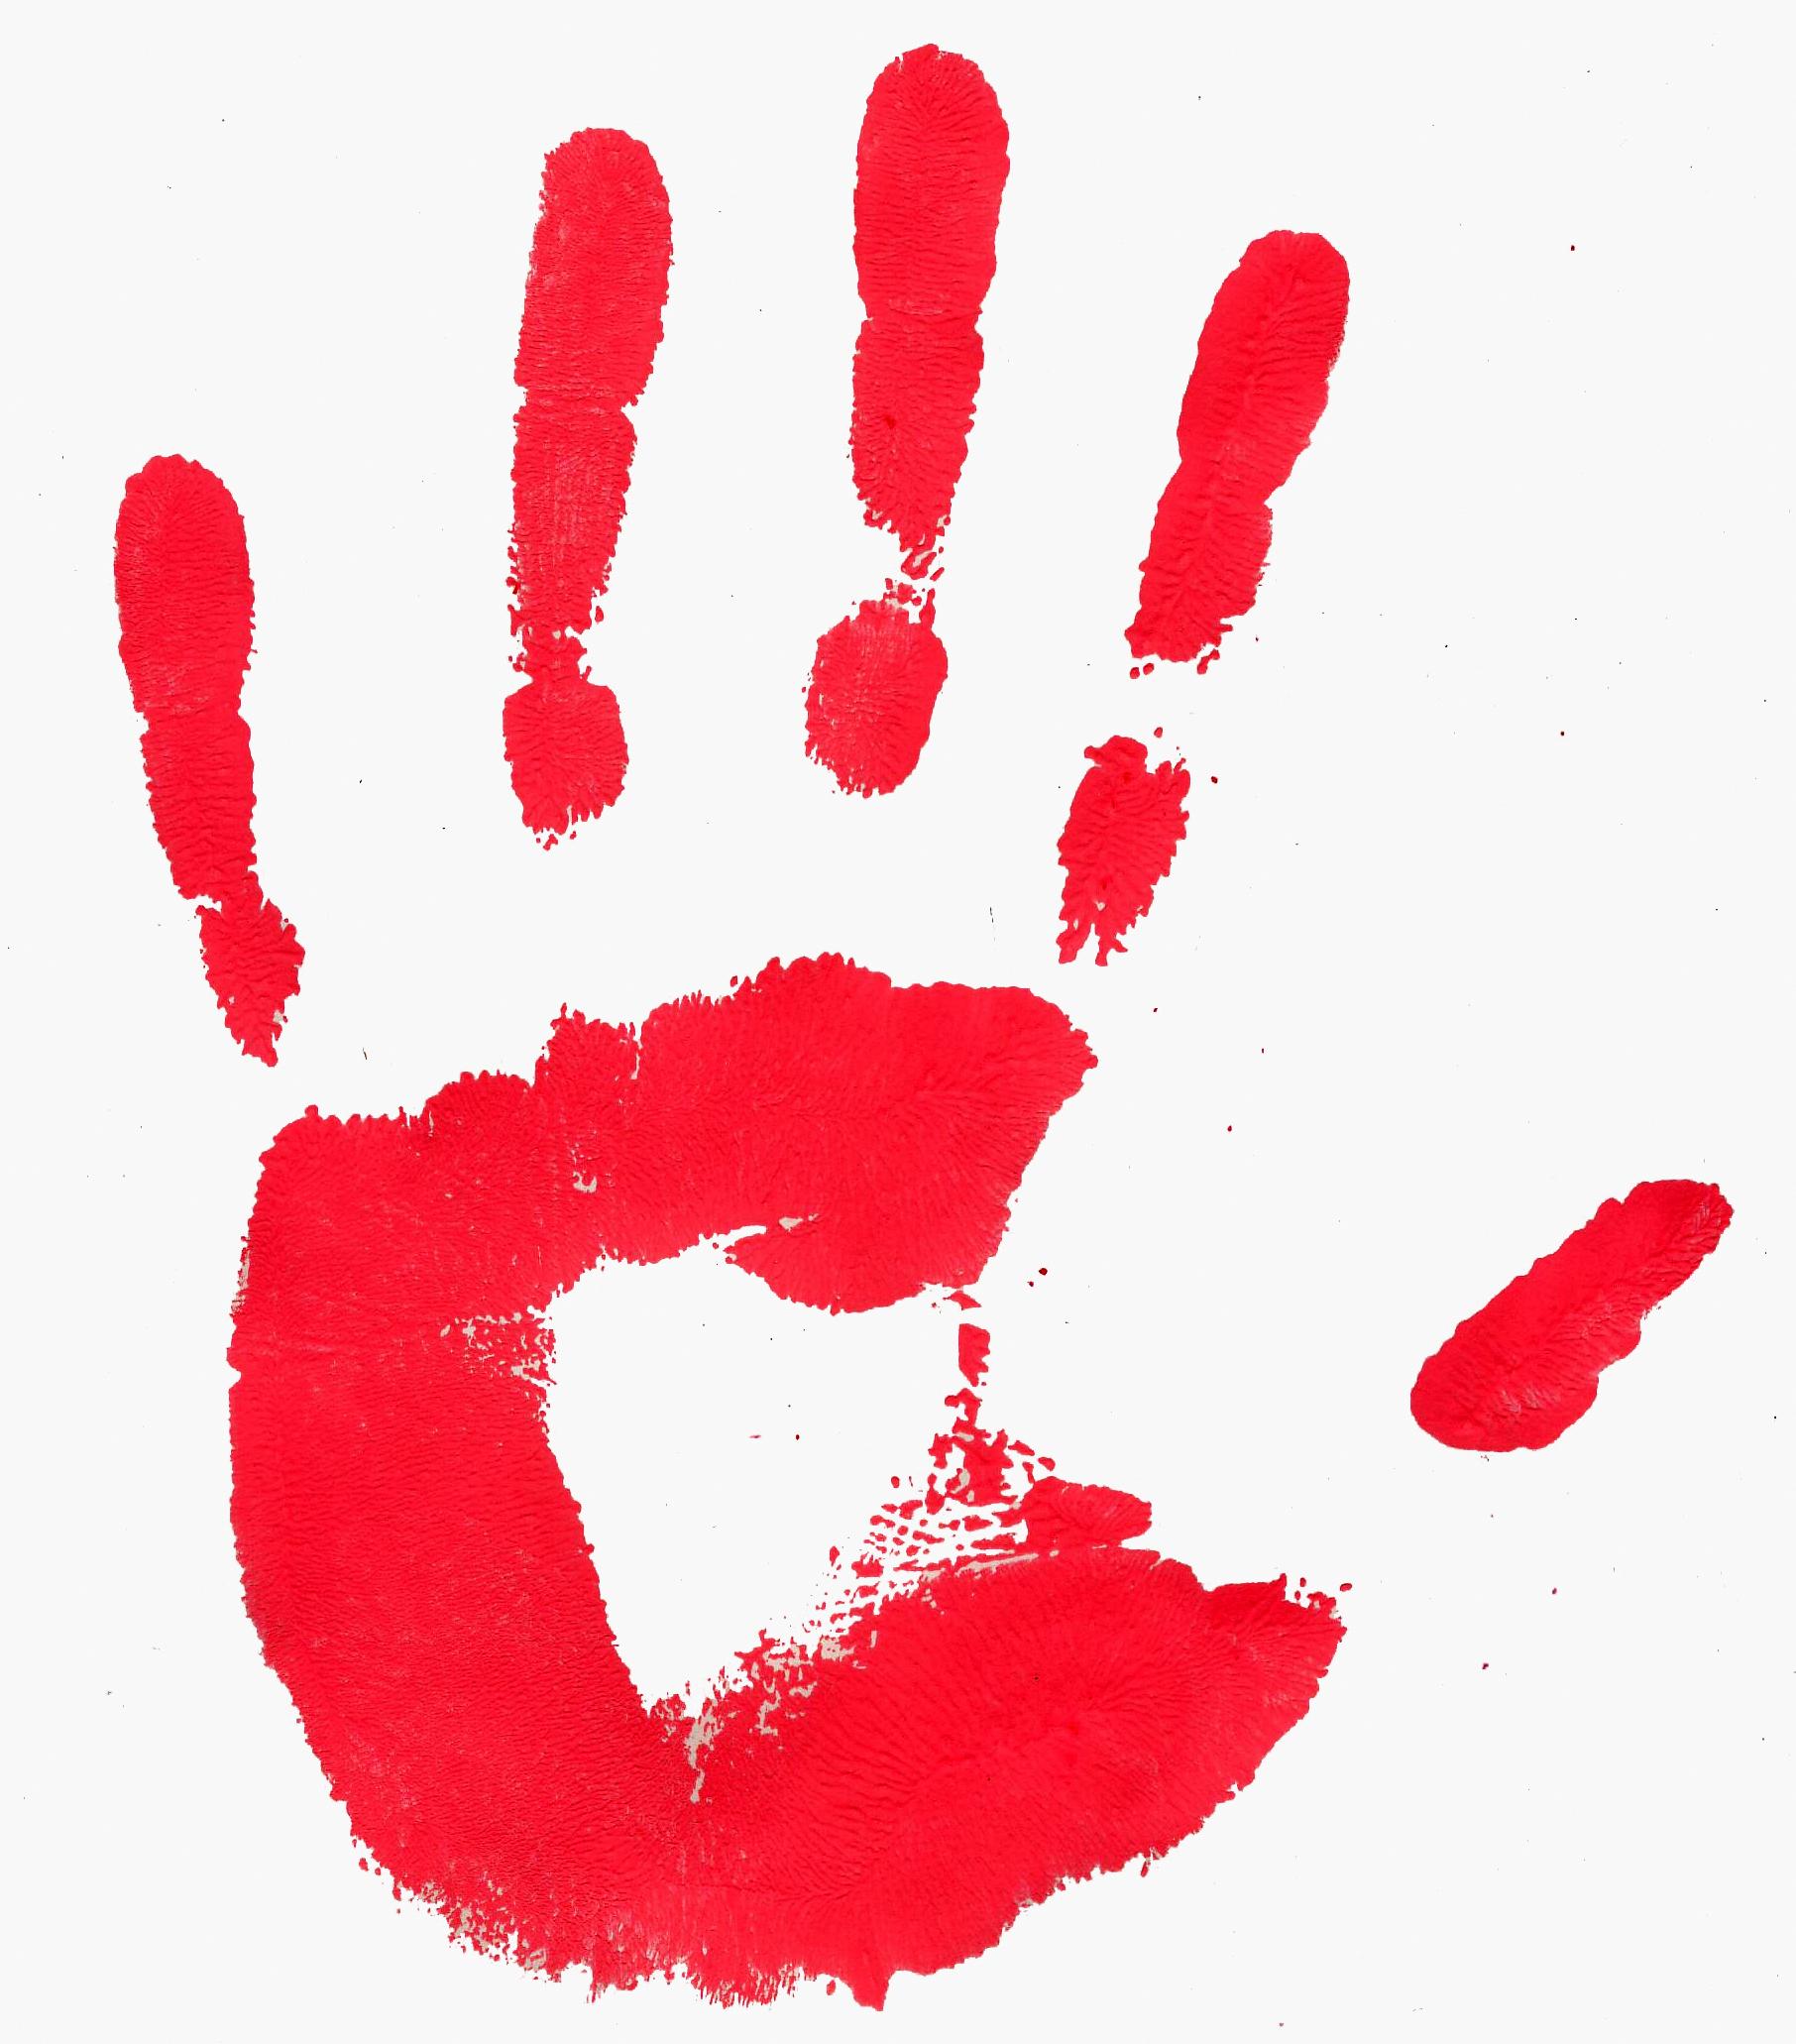 Red Hand Day, Aktion Rote Hand, Logo | Bild (Ausschnitt): © Aktion Rote Hand - www.aktion-rote-hand.de